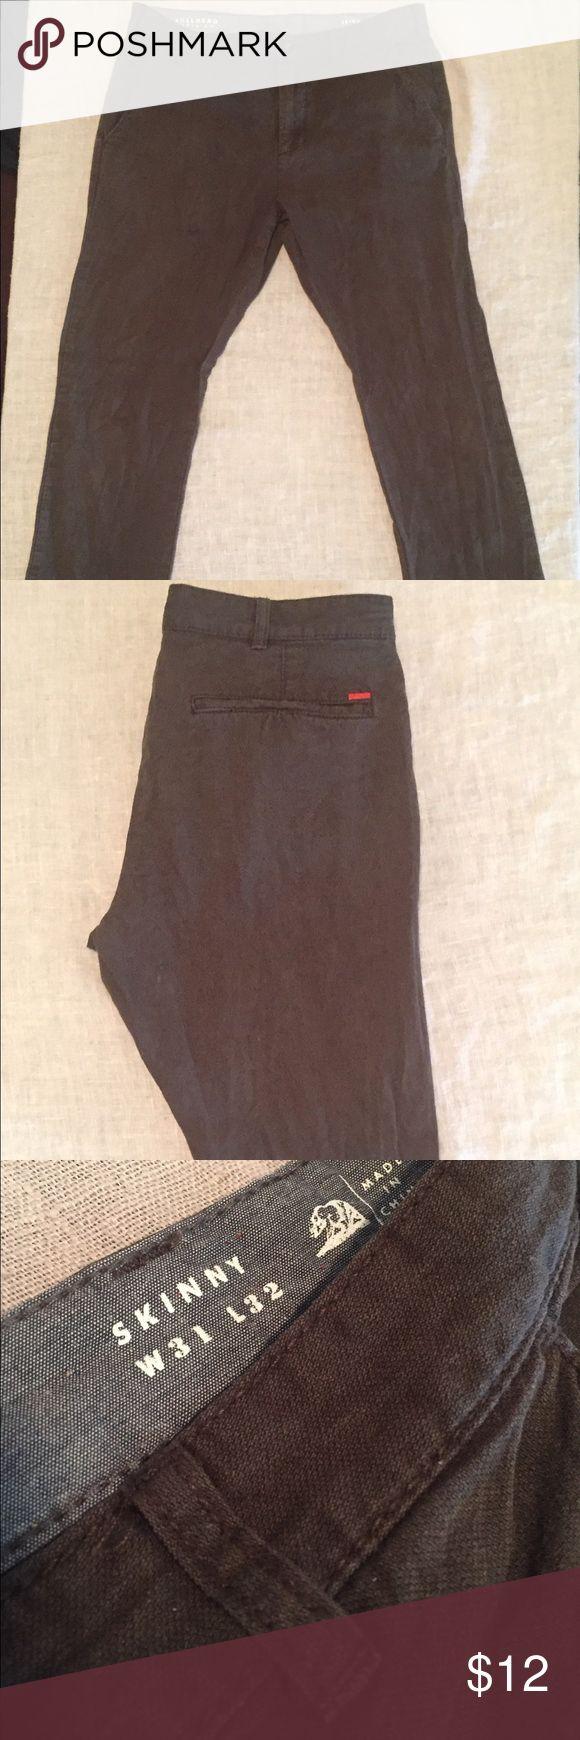 Bullhead Denim Brown Skinny Jeans 31/32 Bullhead Denim Co Brown Skinny Jeans. Great condition! Size: 31/32. Ships immediately! Bullhead Jeans Skinny